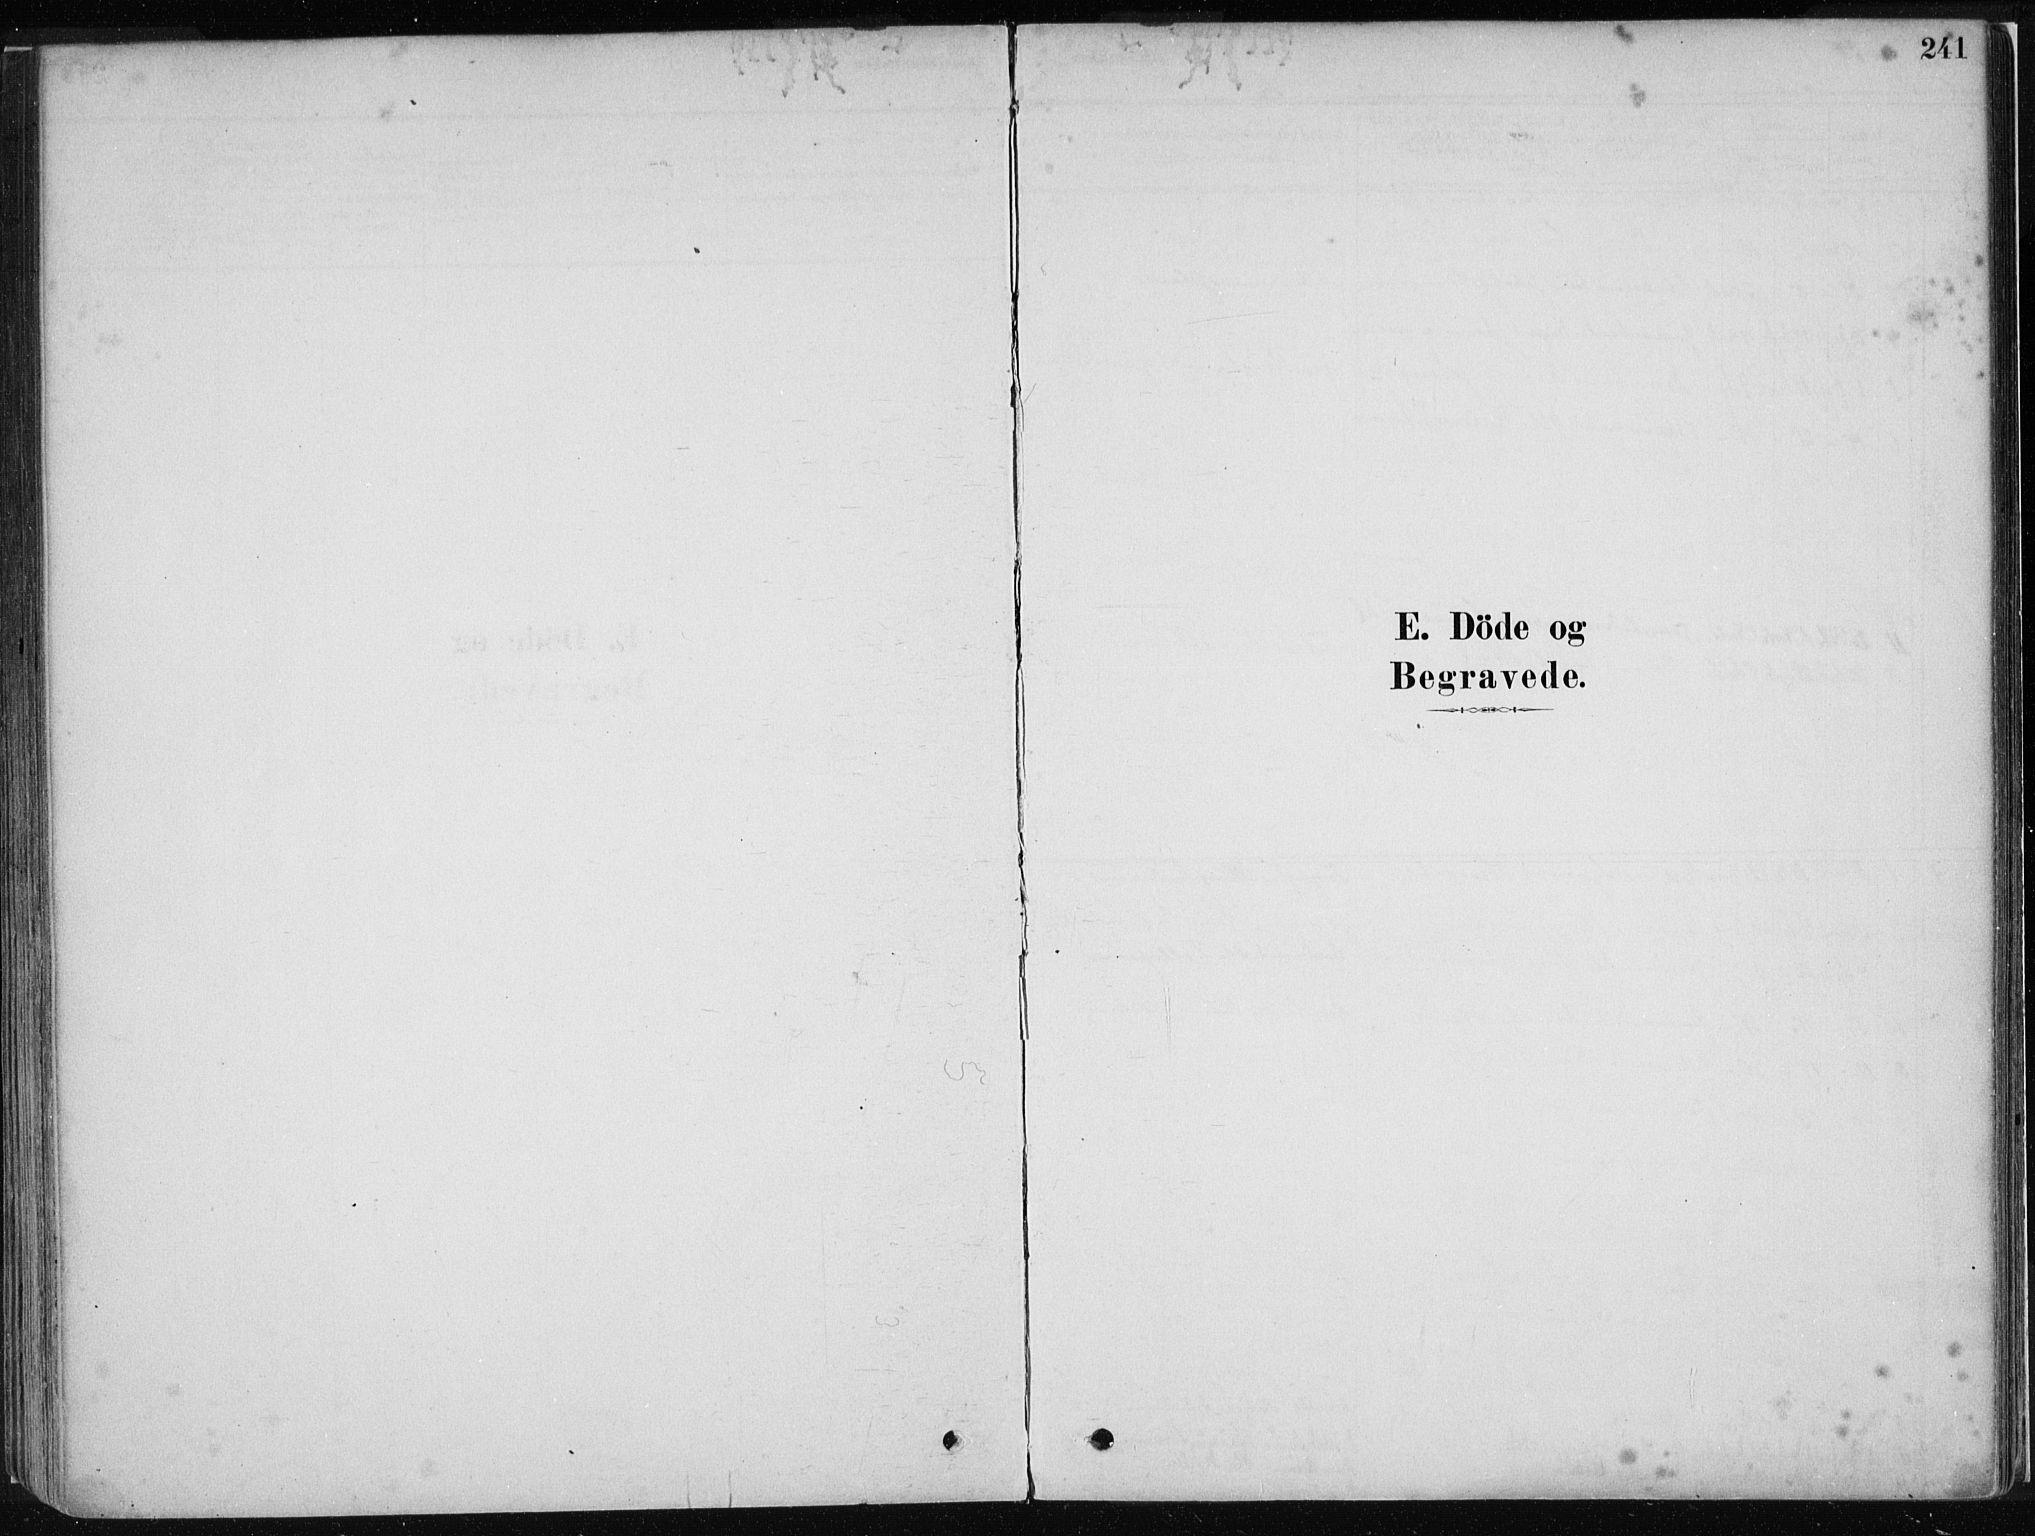 SAB, Stord sokneprestembete, H/Haa: Ministerialbok nr. B 2, 1878-1913, s. 241